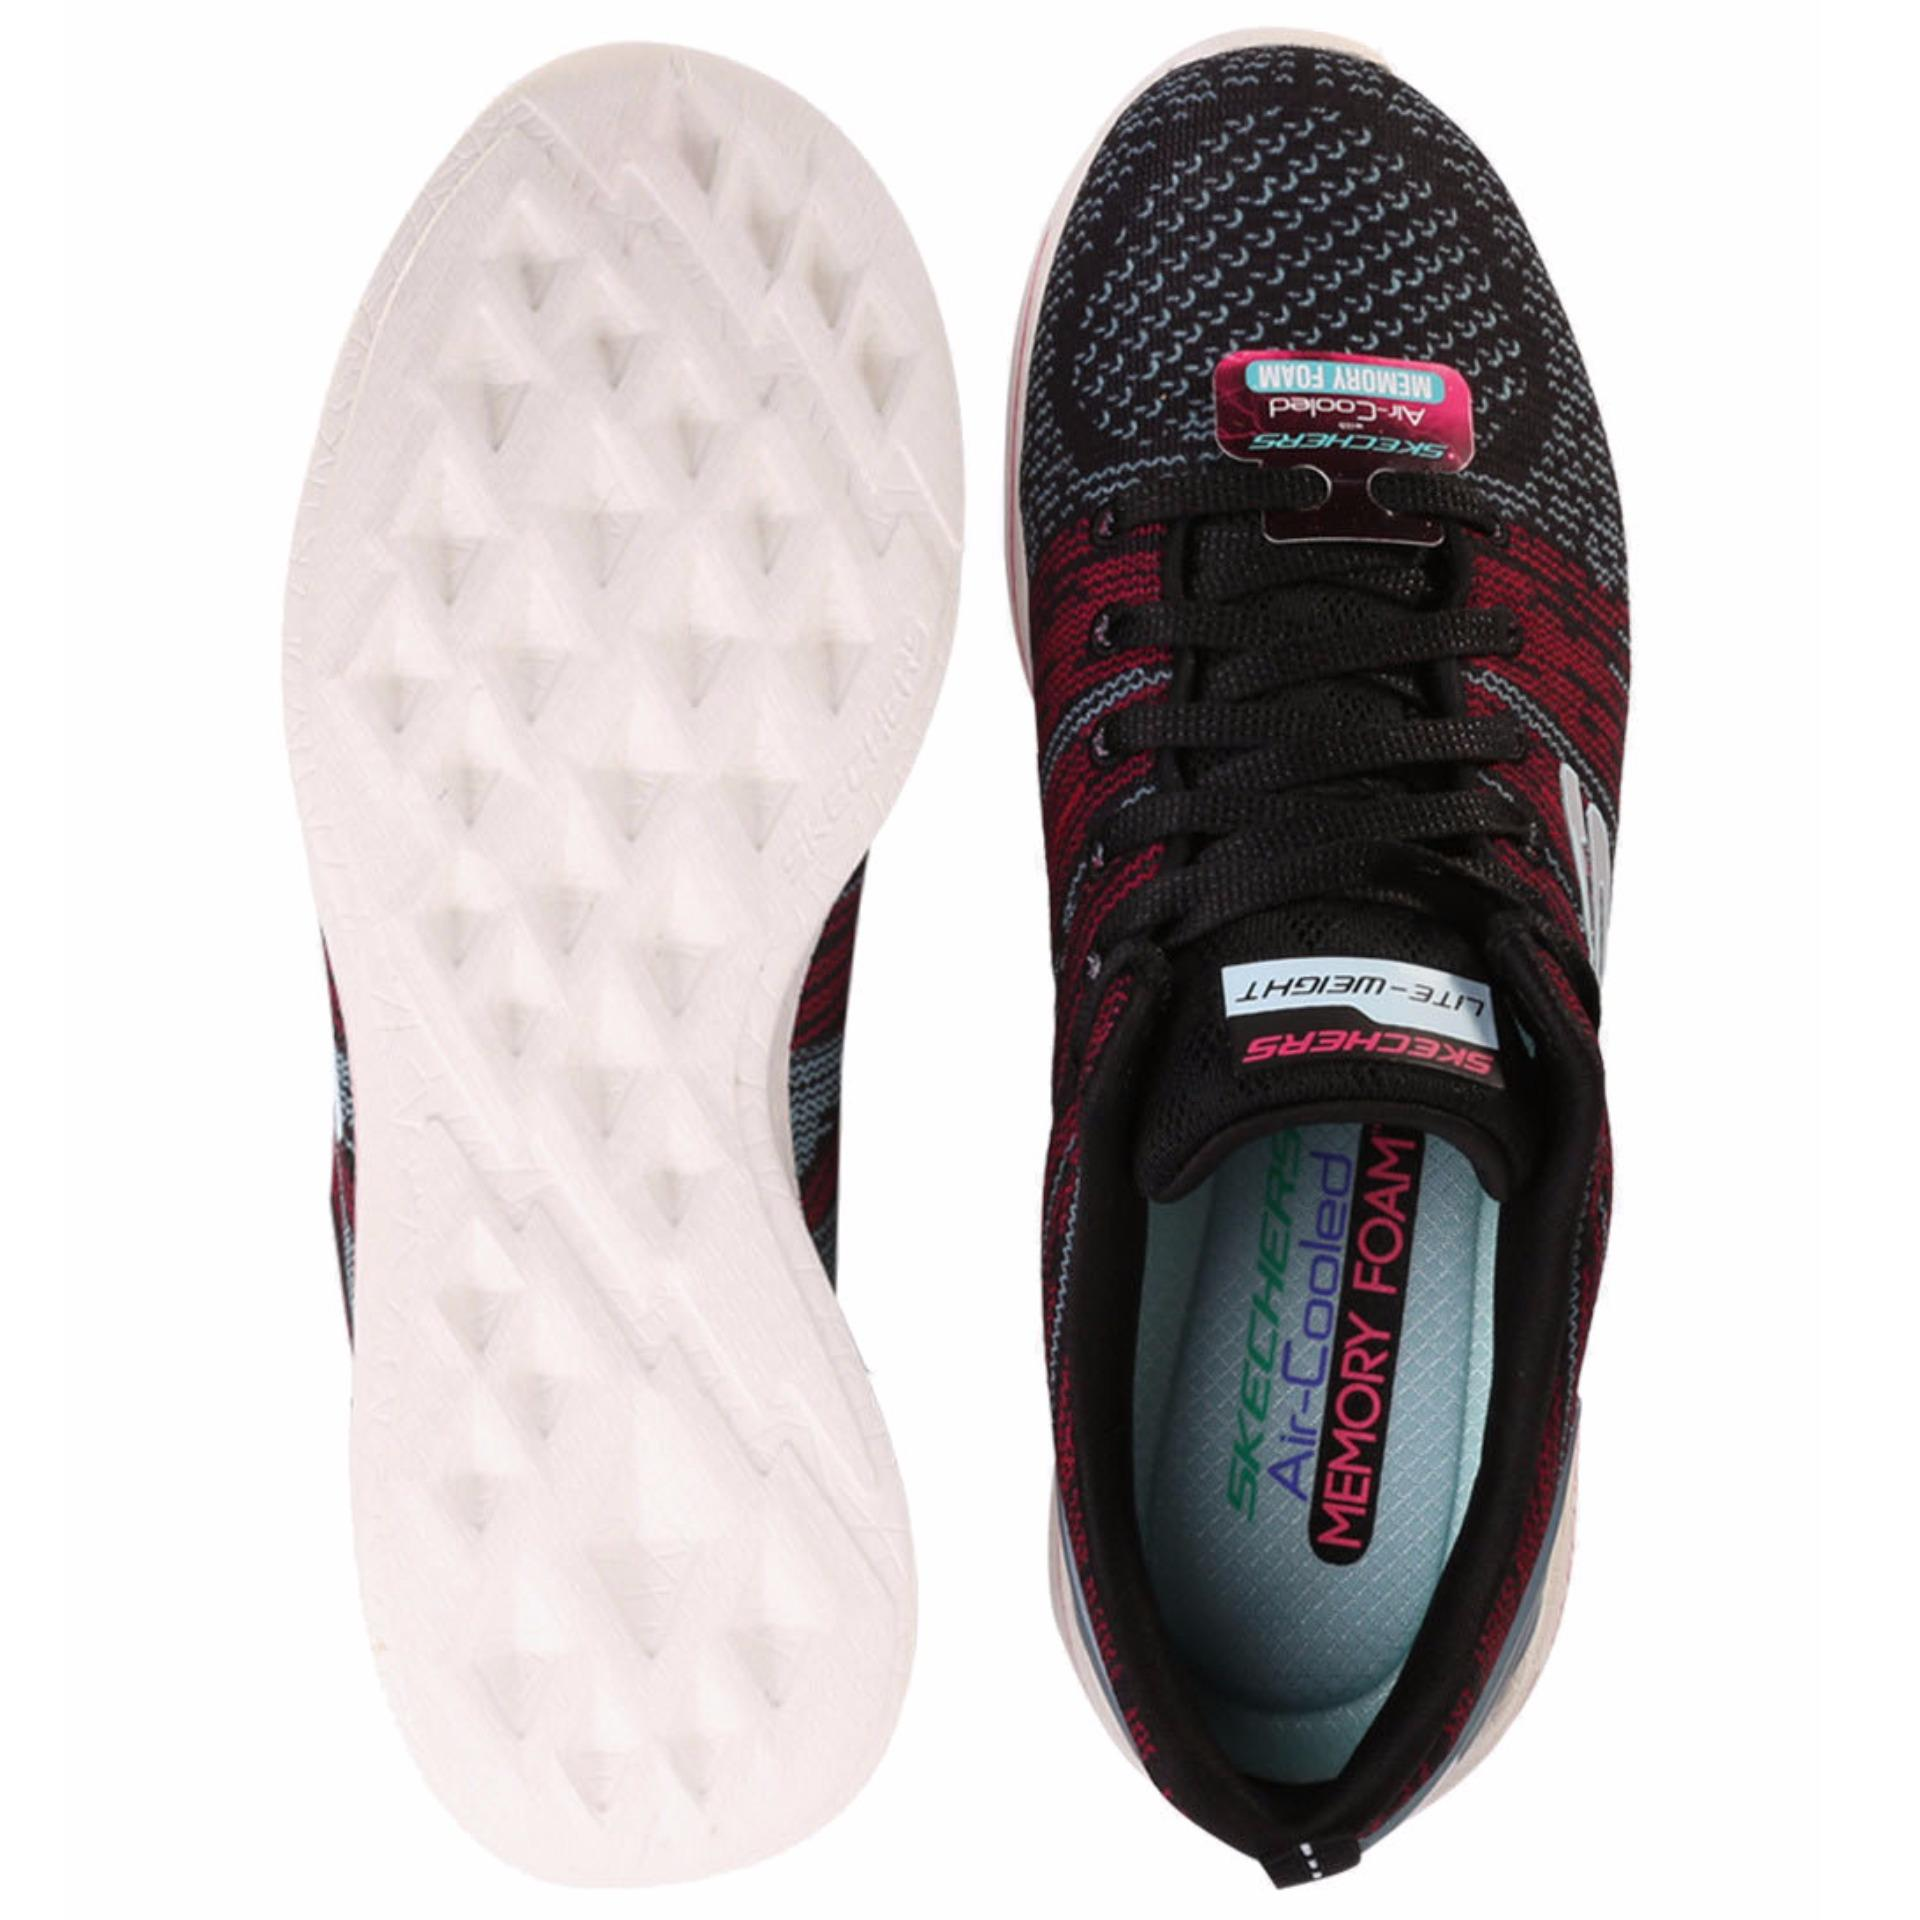 Skechers Burst Tr Inside Out Sepatu Wanita Abu Abu - Daftar Harga ... 86344d1047